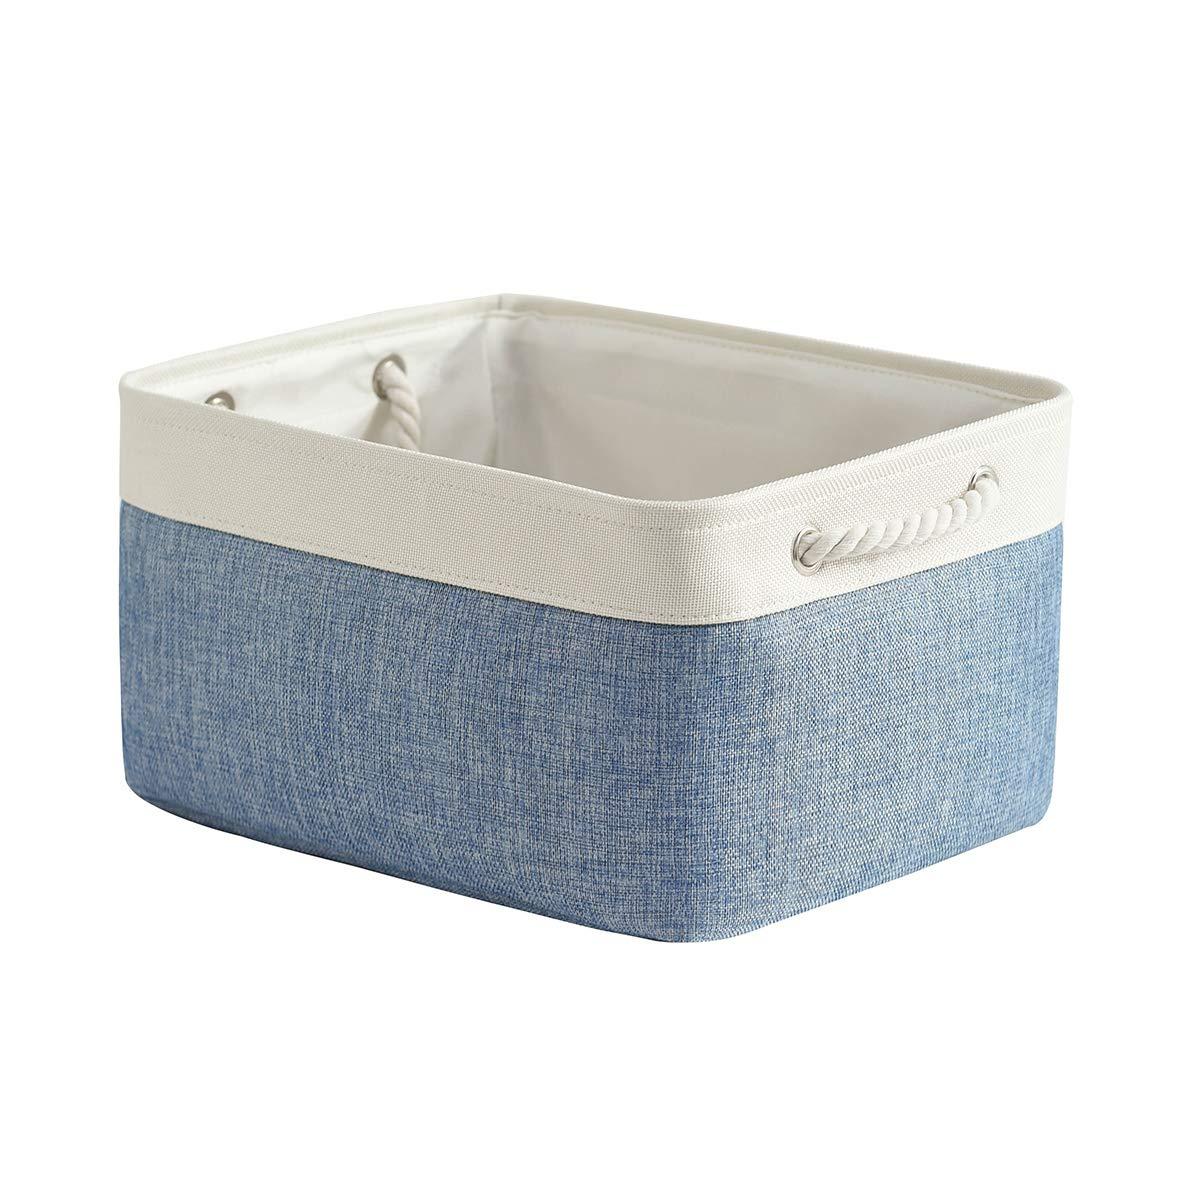 Large Fabric Basket Storage Basket Baskets for Shelves Cloth Baskets for Storage Dog Toy Basket Decorative Storage Bin for Shelf Nursery Home Closet & Office (15.7L×11.8W×8.3H inch, White&Blue)